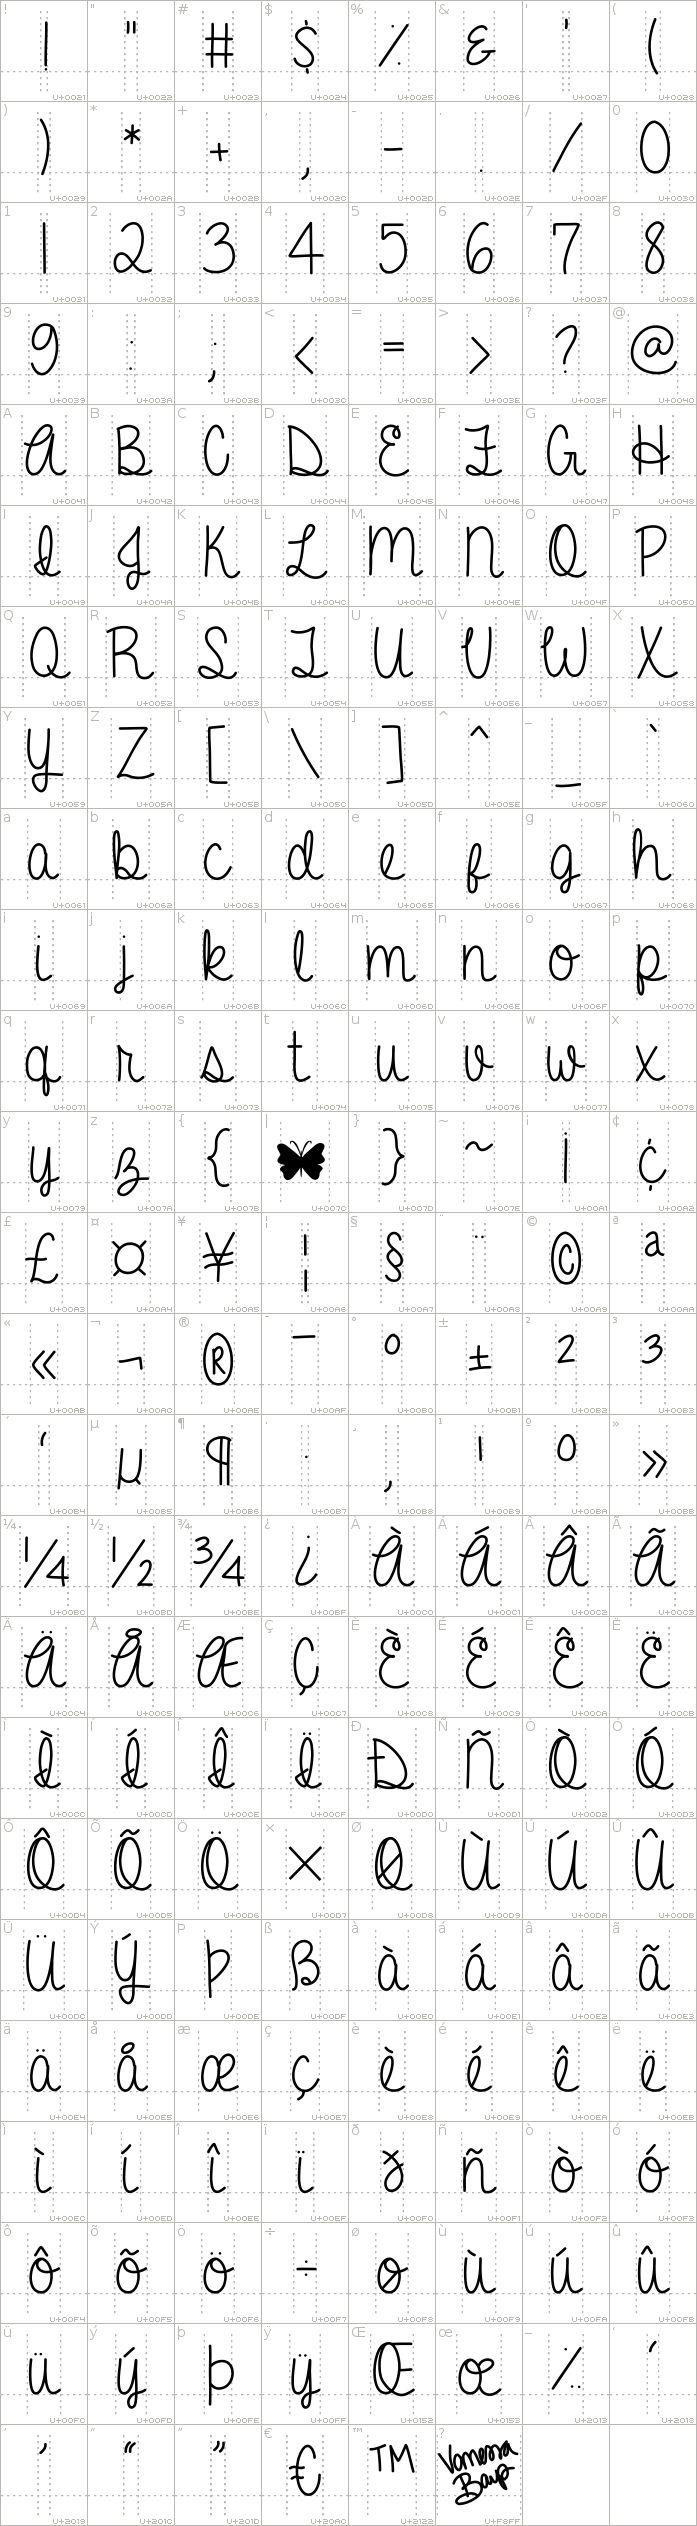 50 best Lettering images on Pinterest | Creative lettering